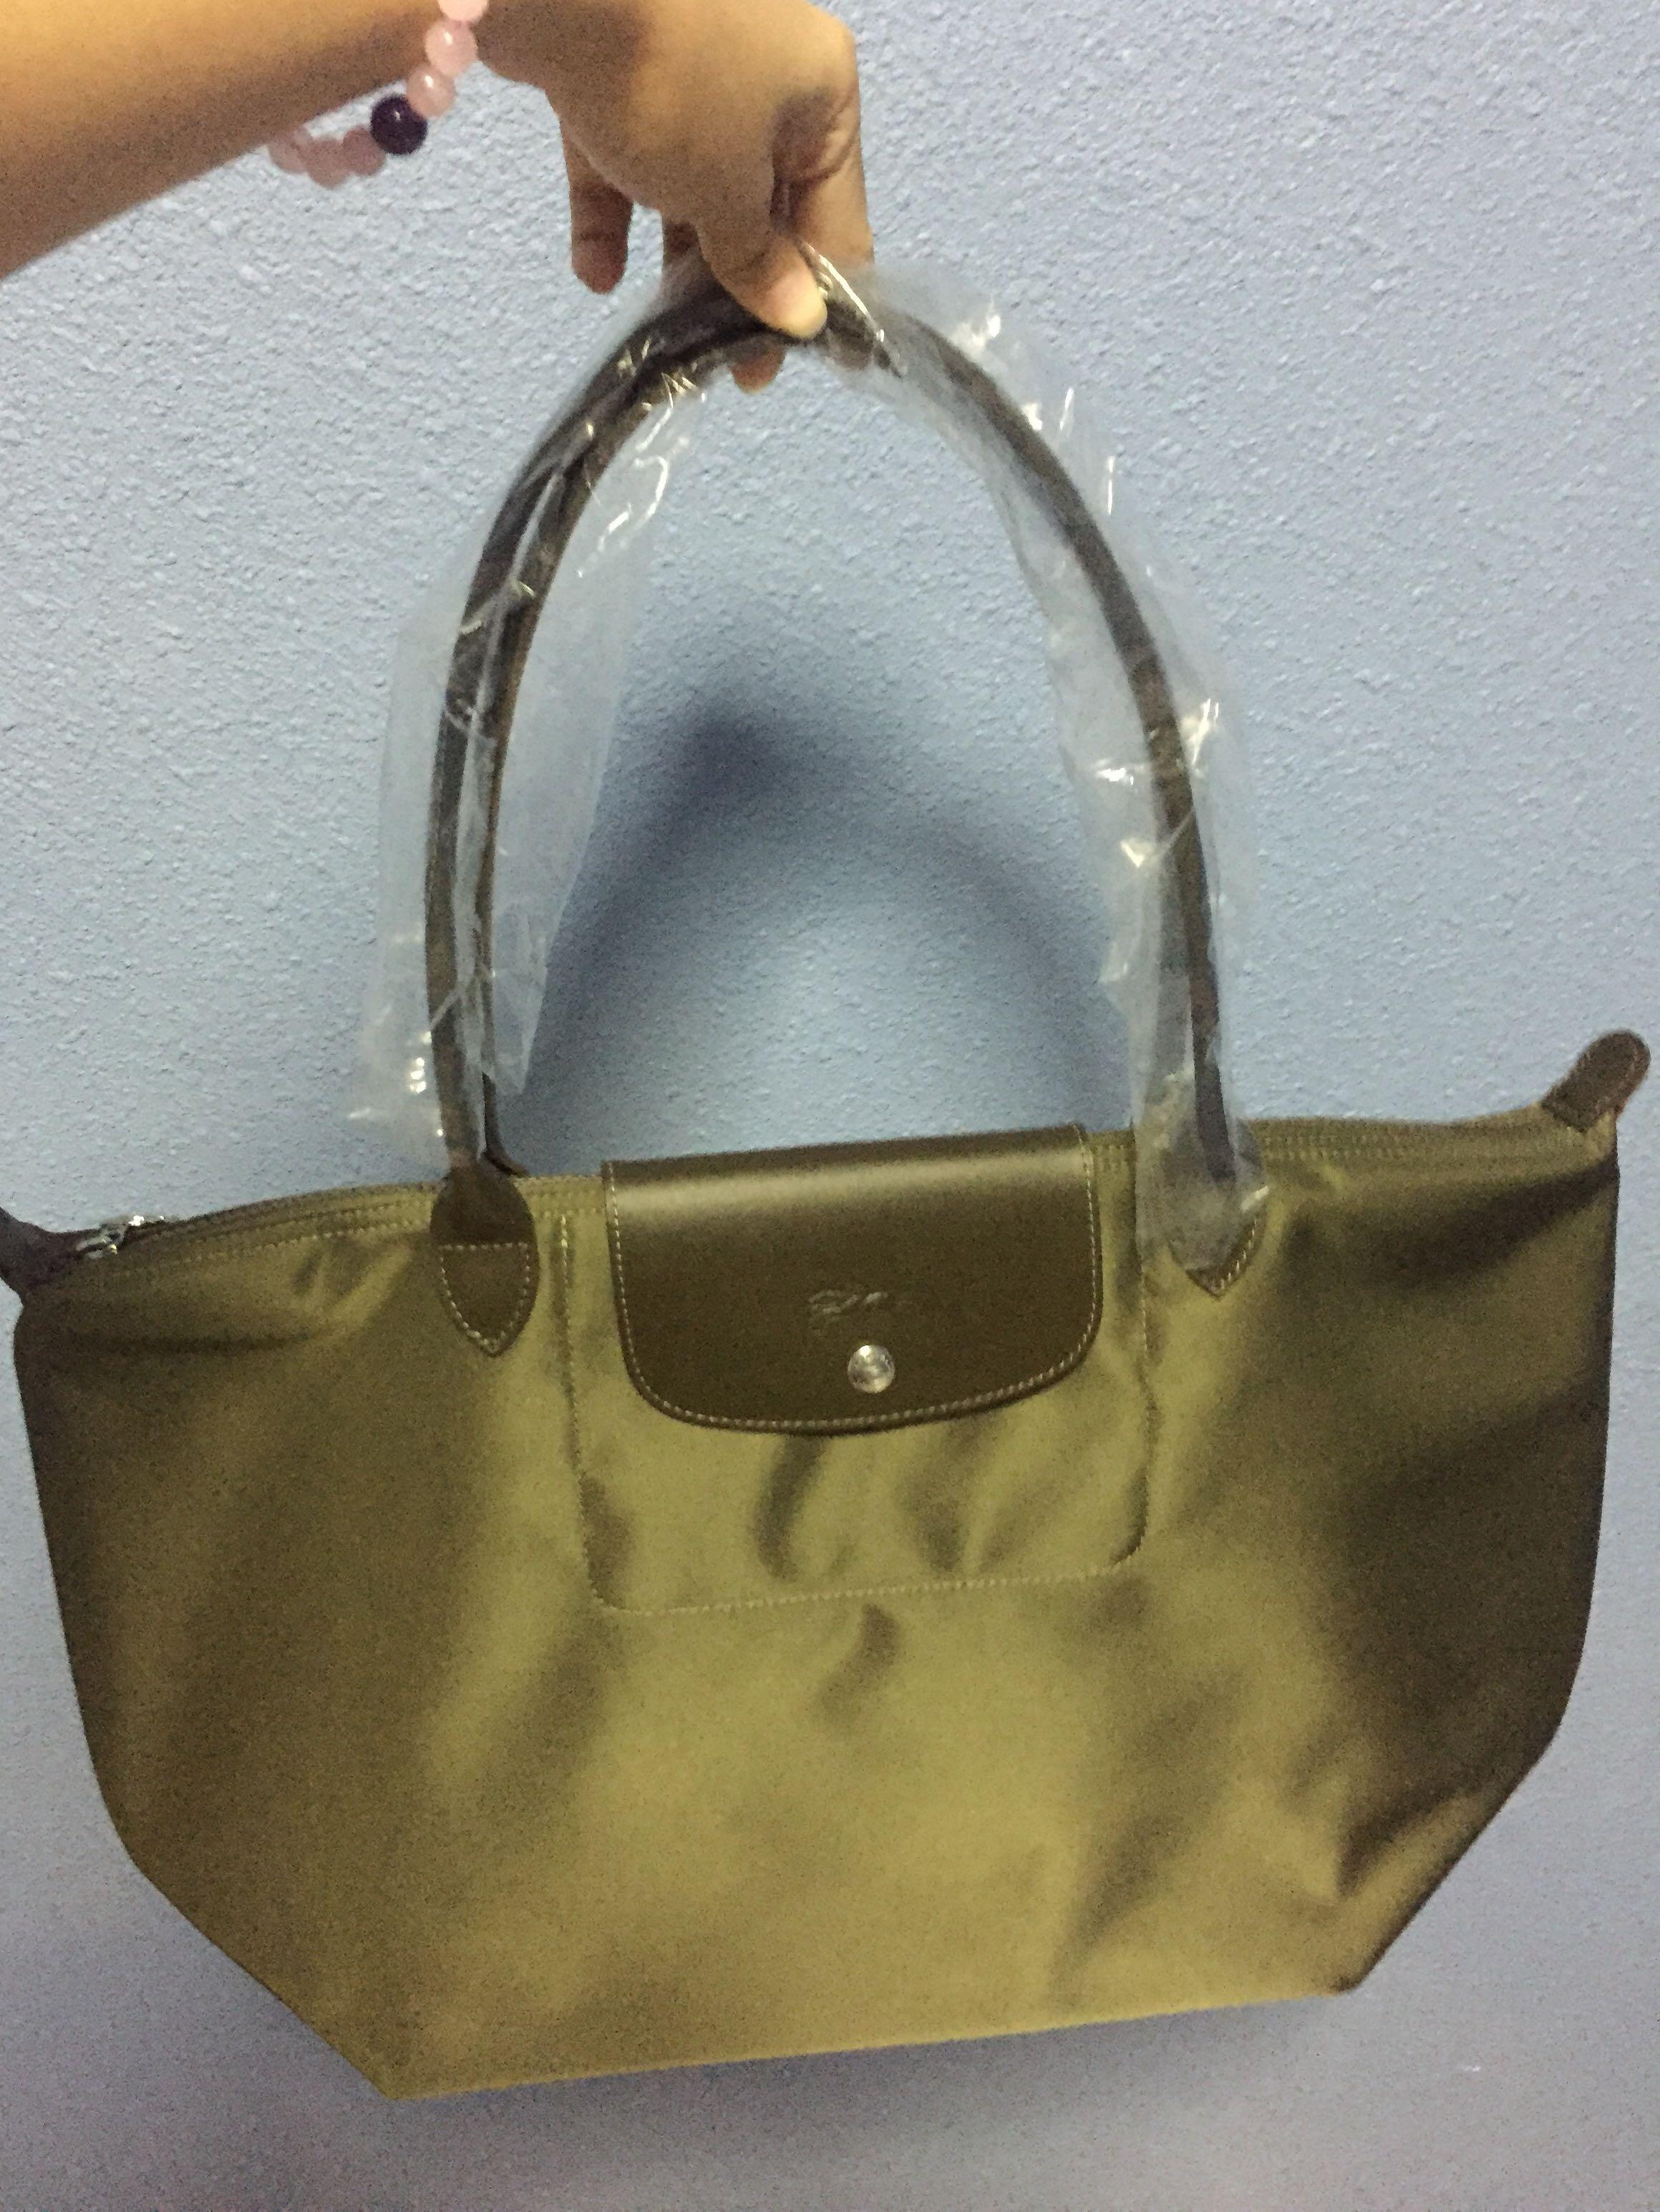 6cf39e3a637 Longchamp Le Pliage khaki Olive Green (Medium), Women's Fashion, Bags &  Wallets on Carousell